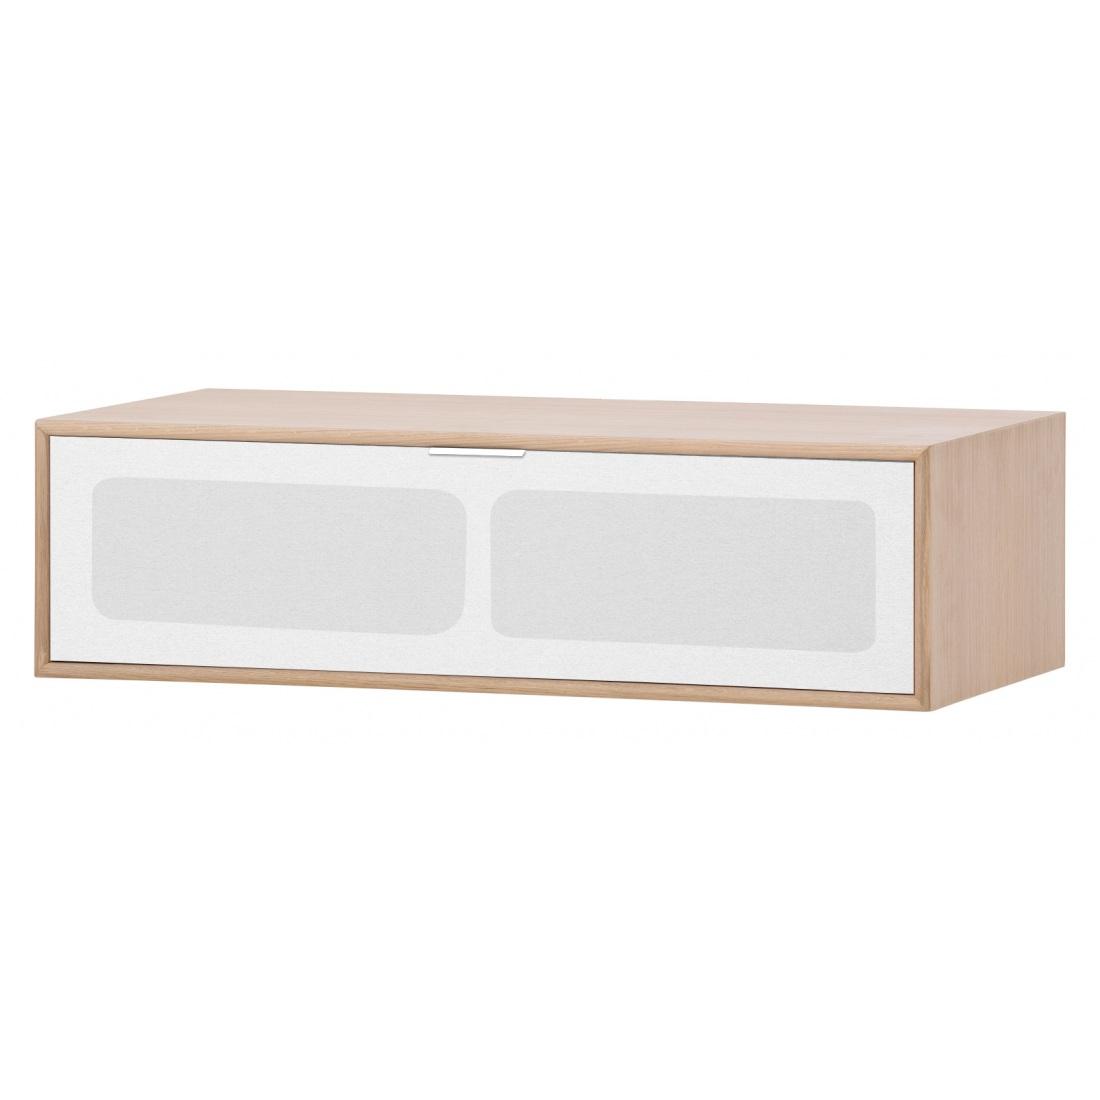 Lowboard Eiche Weiß Sideboard Tv Schrank Moebel Liebecom